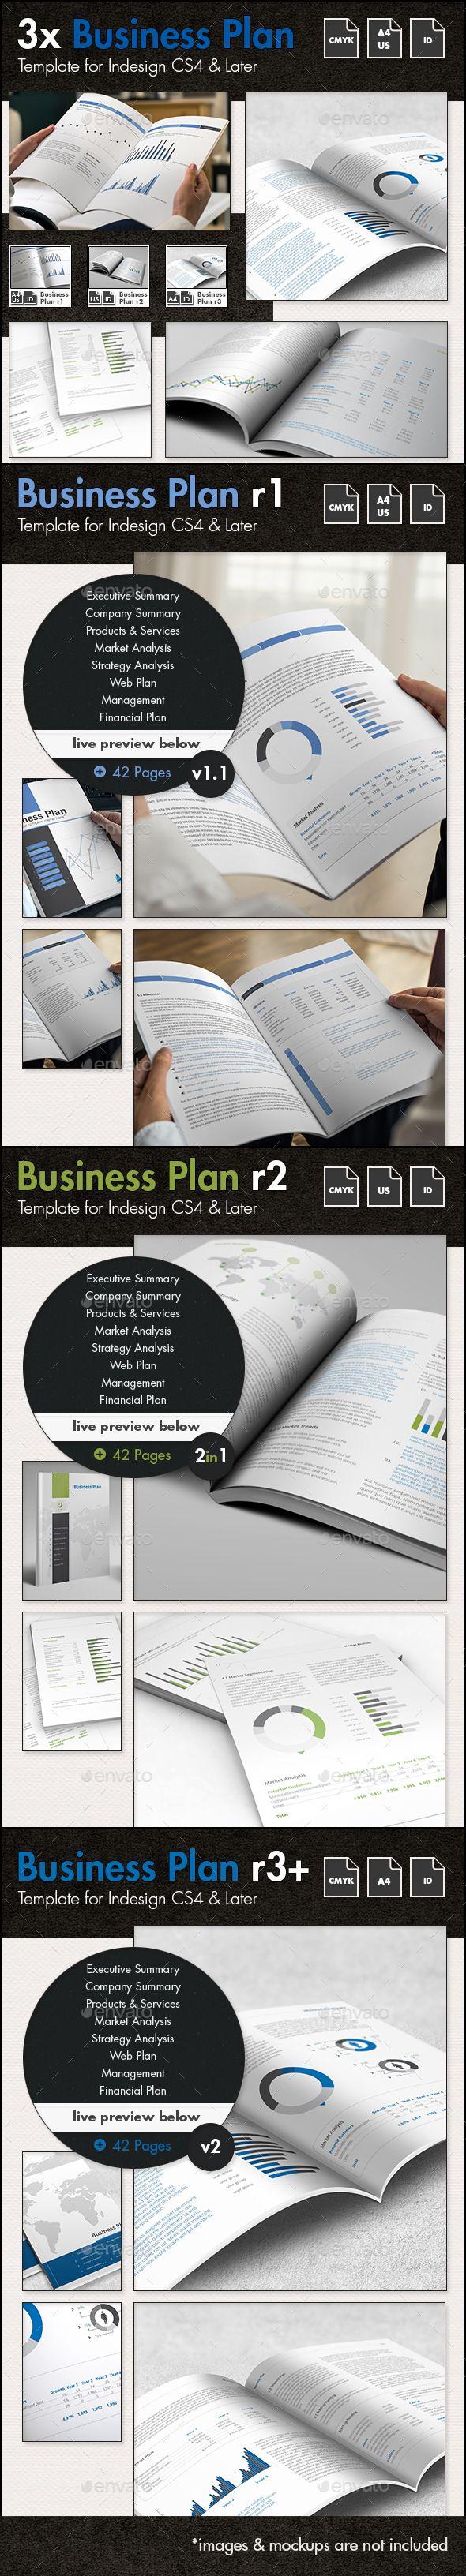 Buy a business plan essay oneclickdiamond com